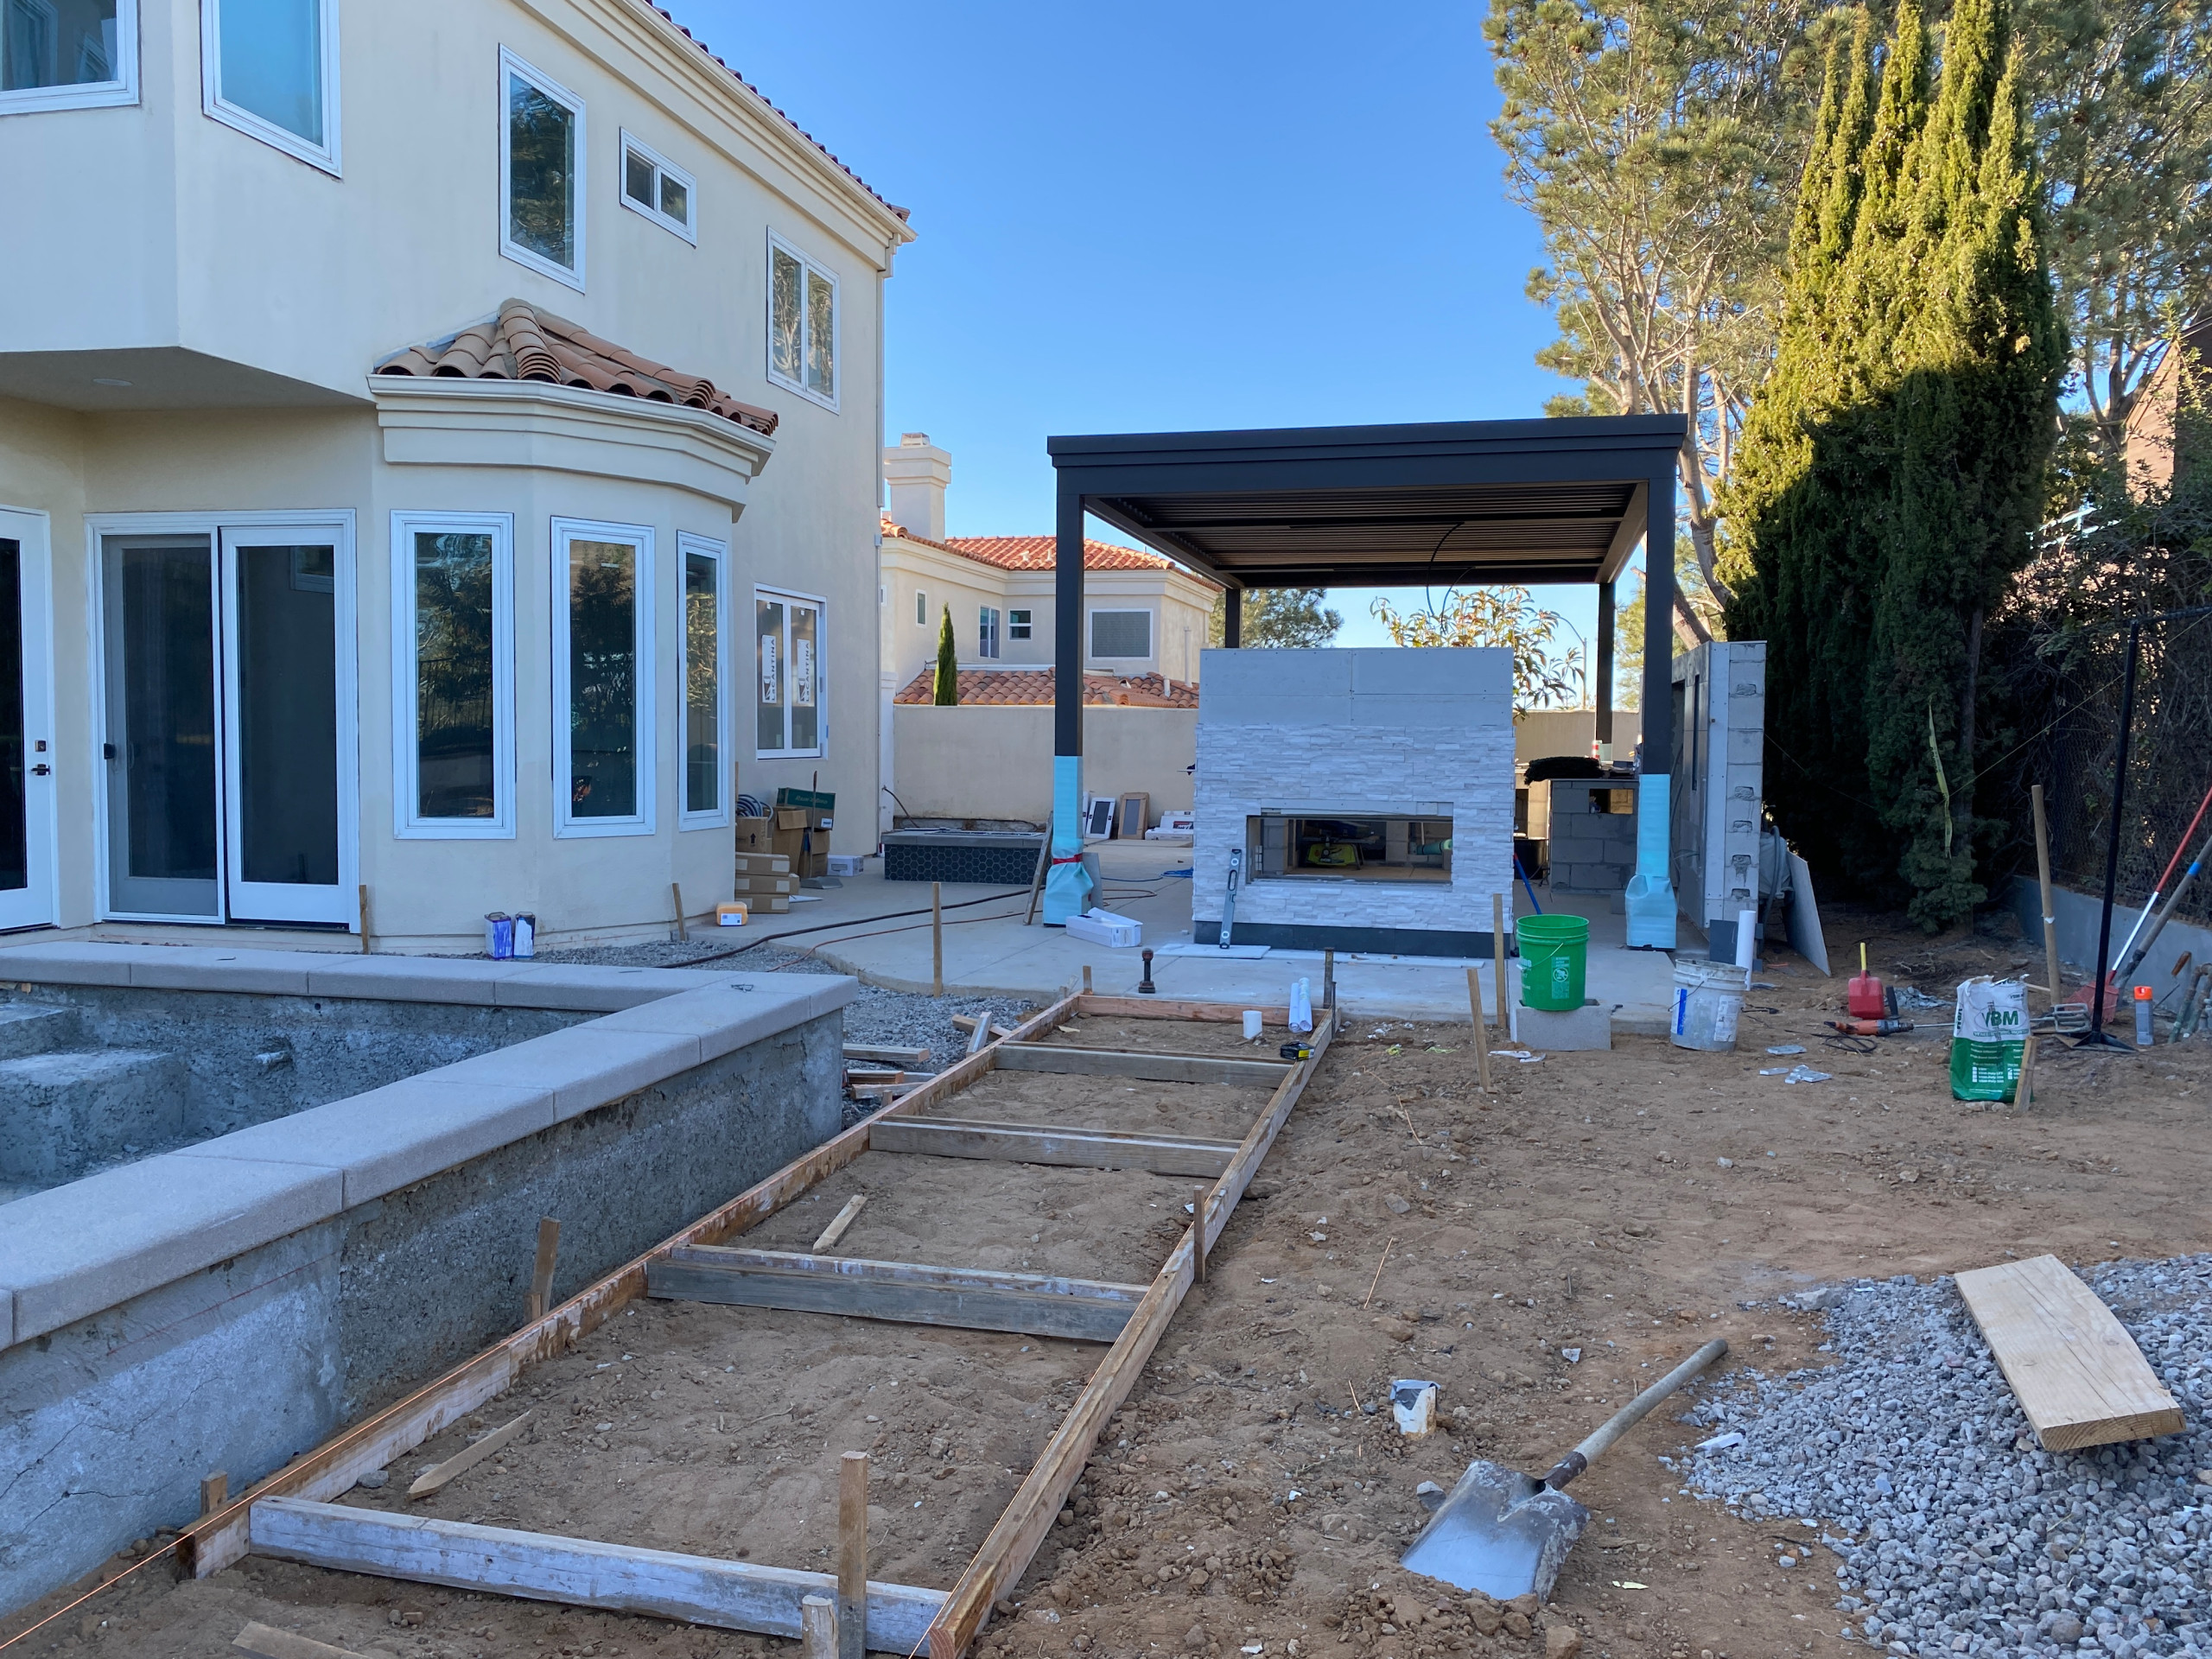 Concrete Pour and Fireplace Construction